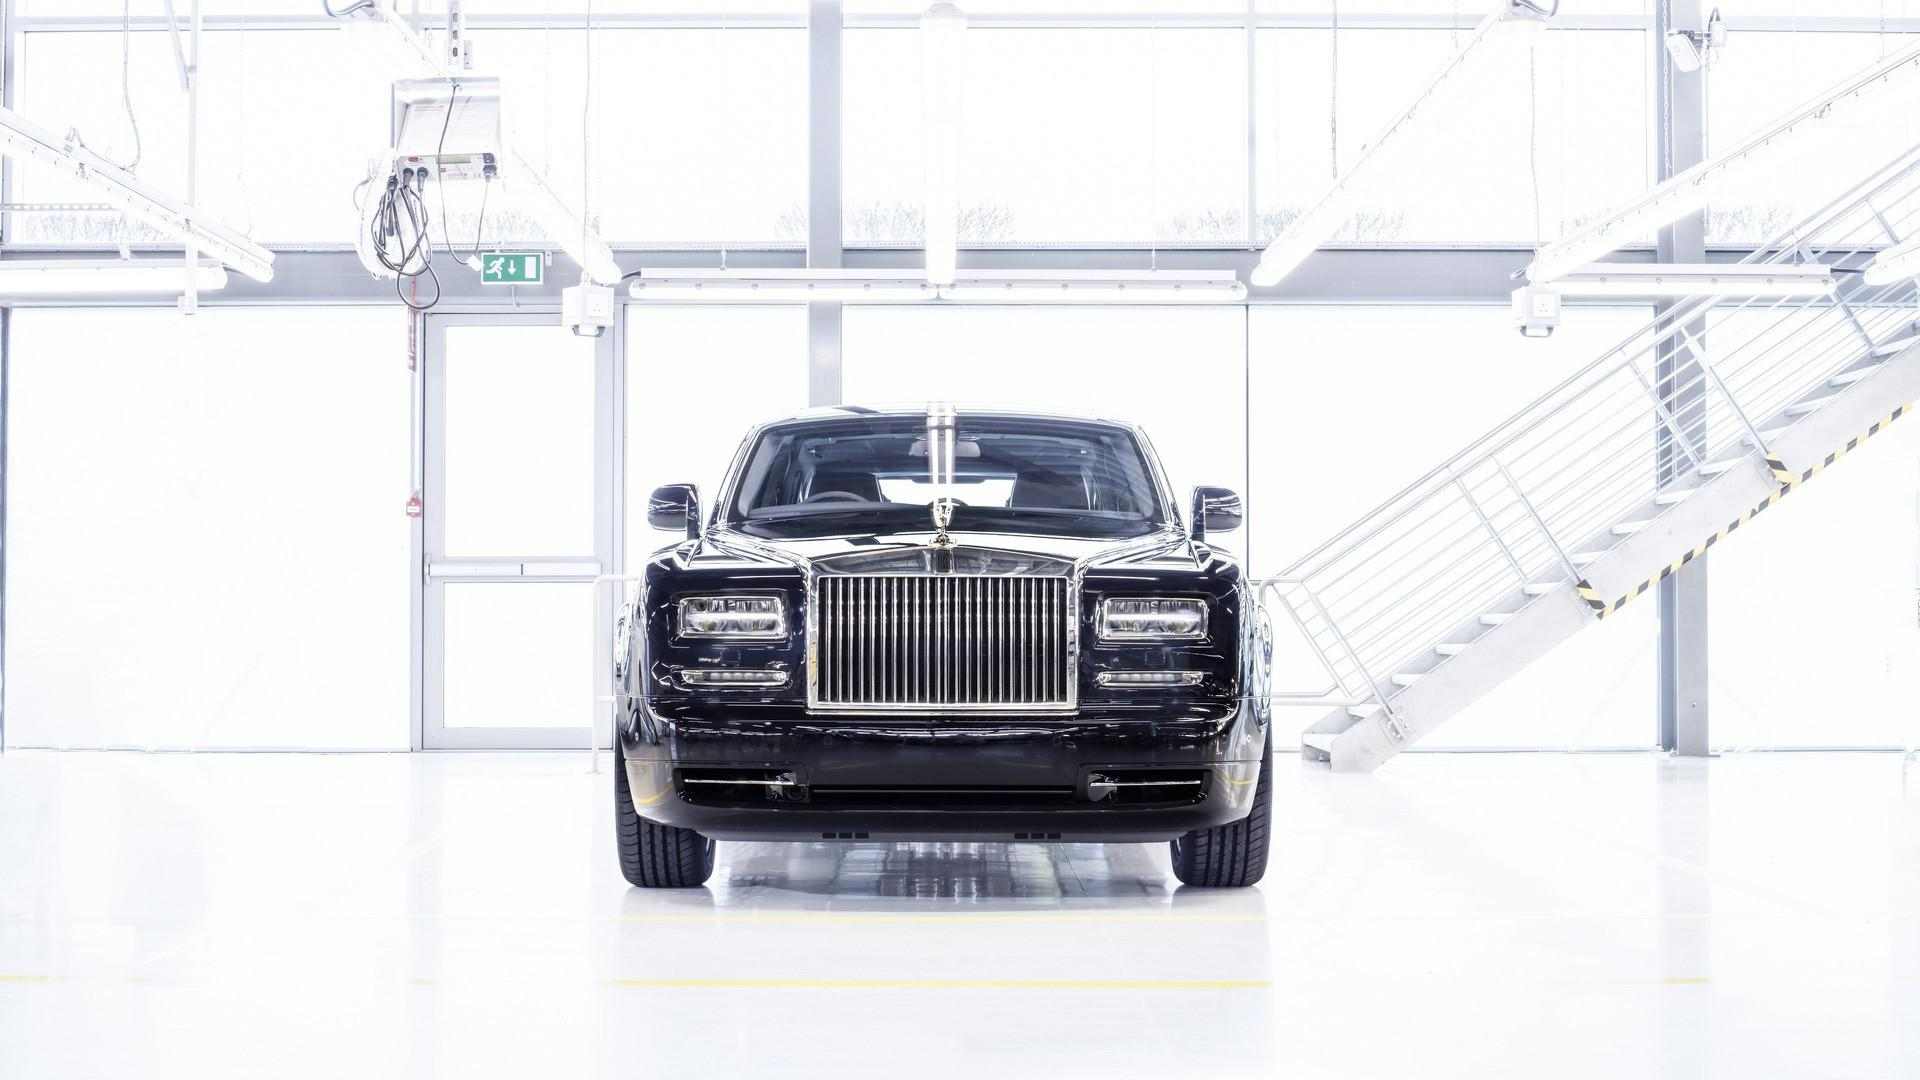 La dernière Rolls-Royce Phantom VII vient de sortir